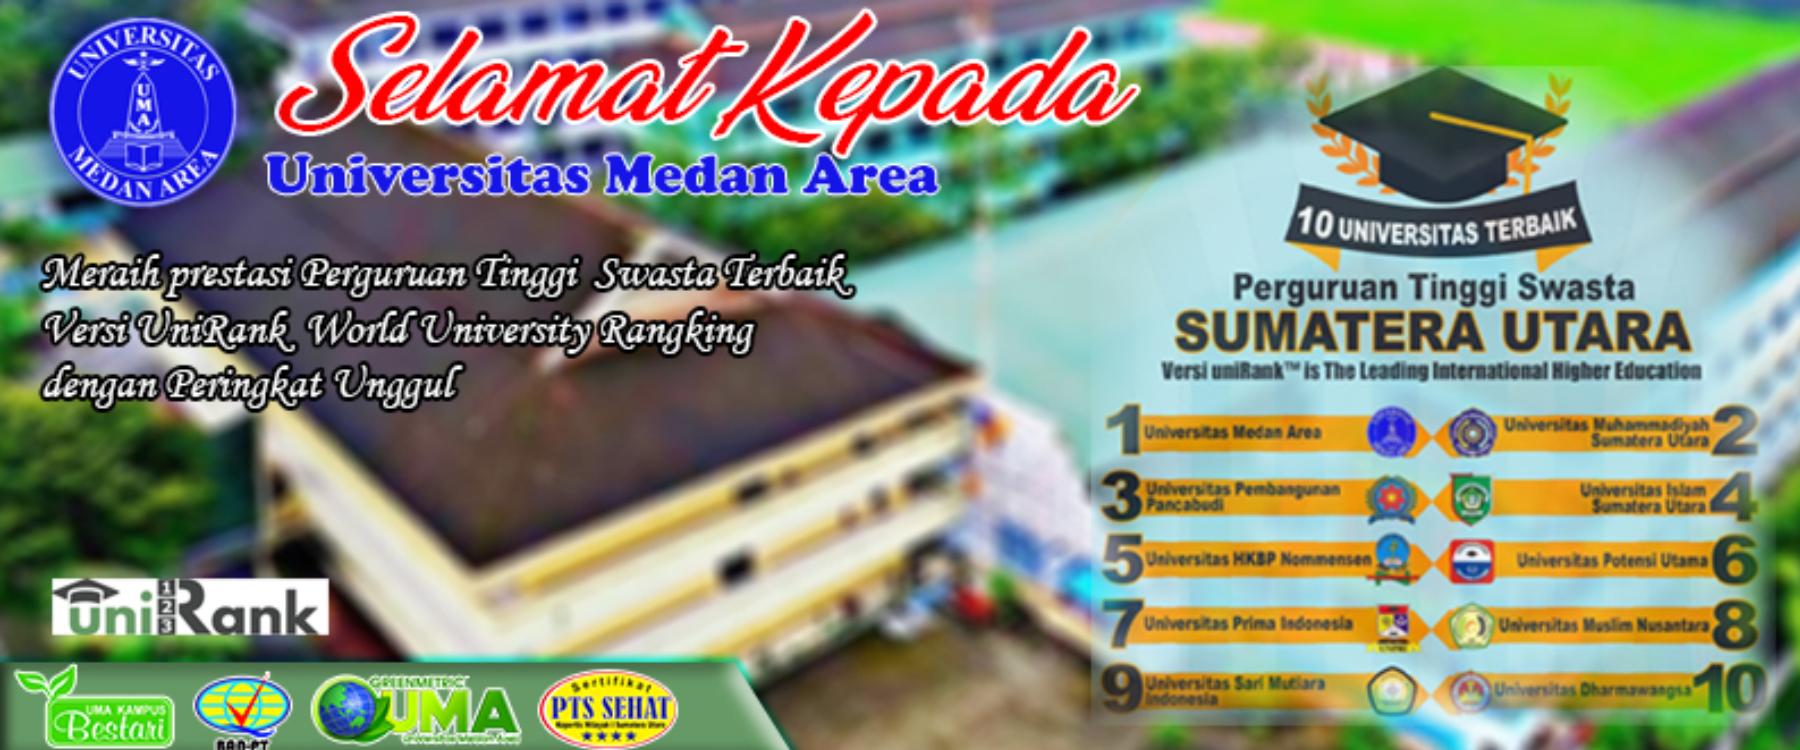 Universitas Medan Area Perguruan Tinggi Swasta Terbaik Se-Sumatera Utara